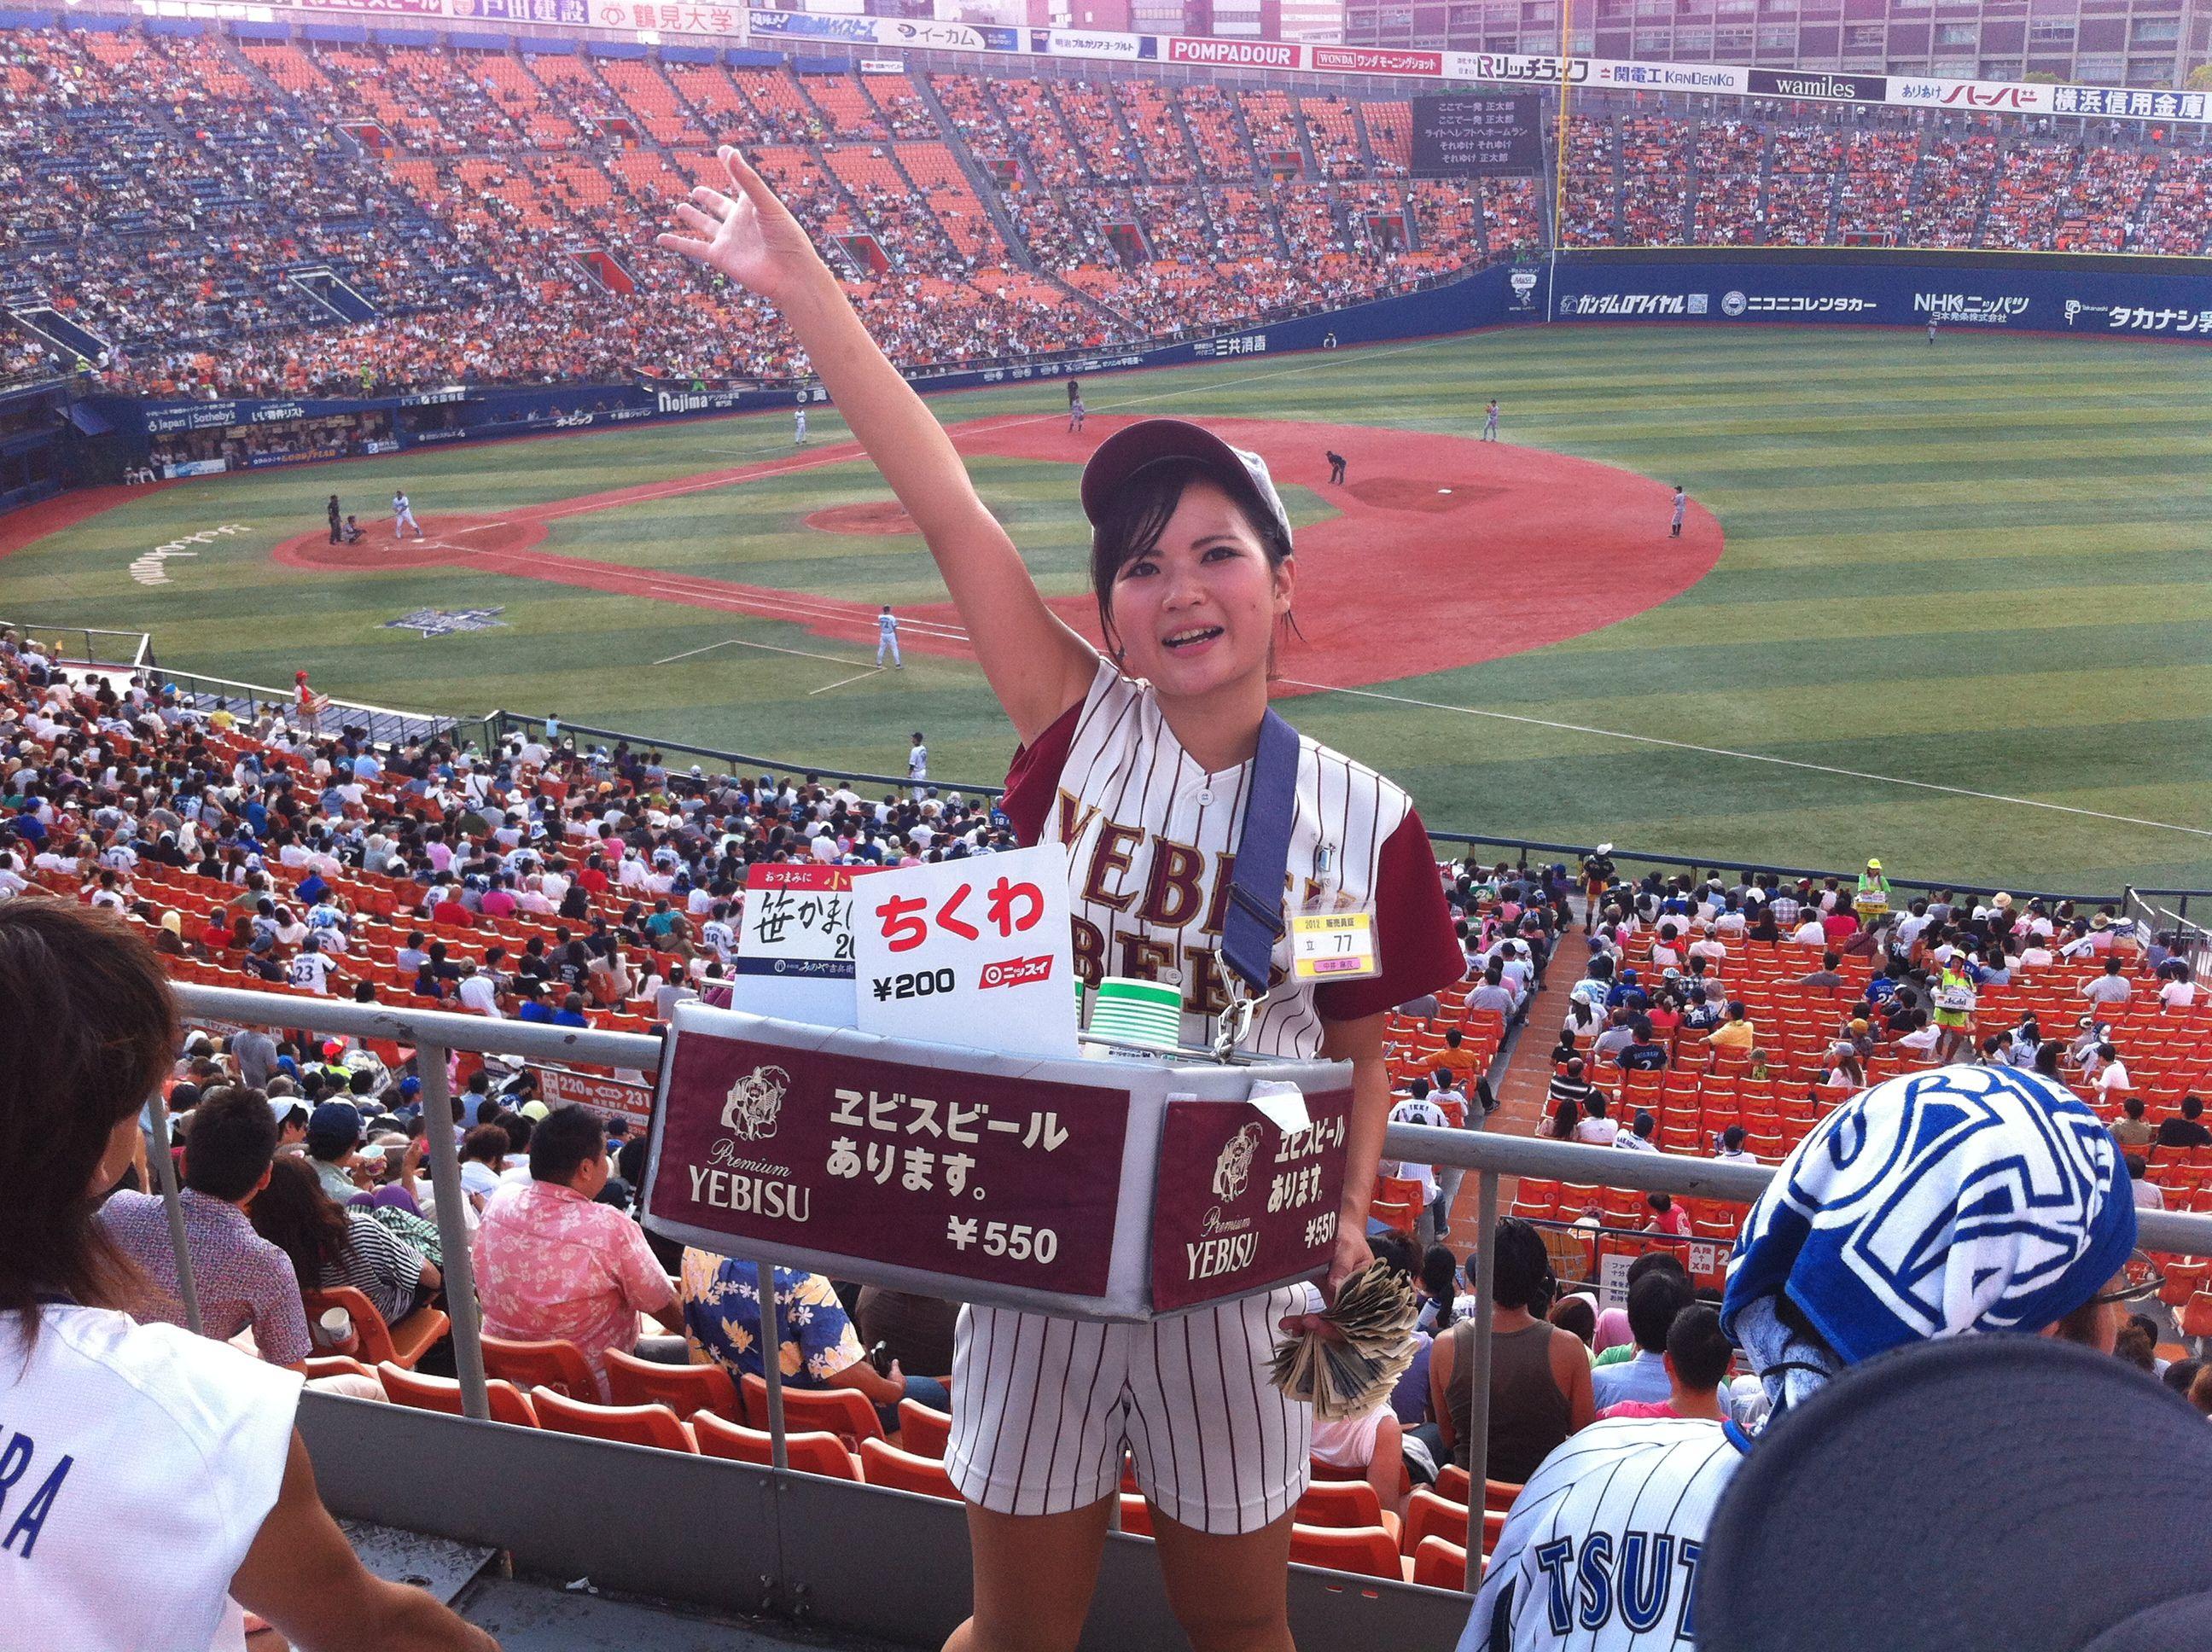 Beer girl at the Japanese Professional Baseball Game